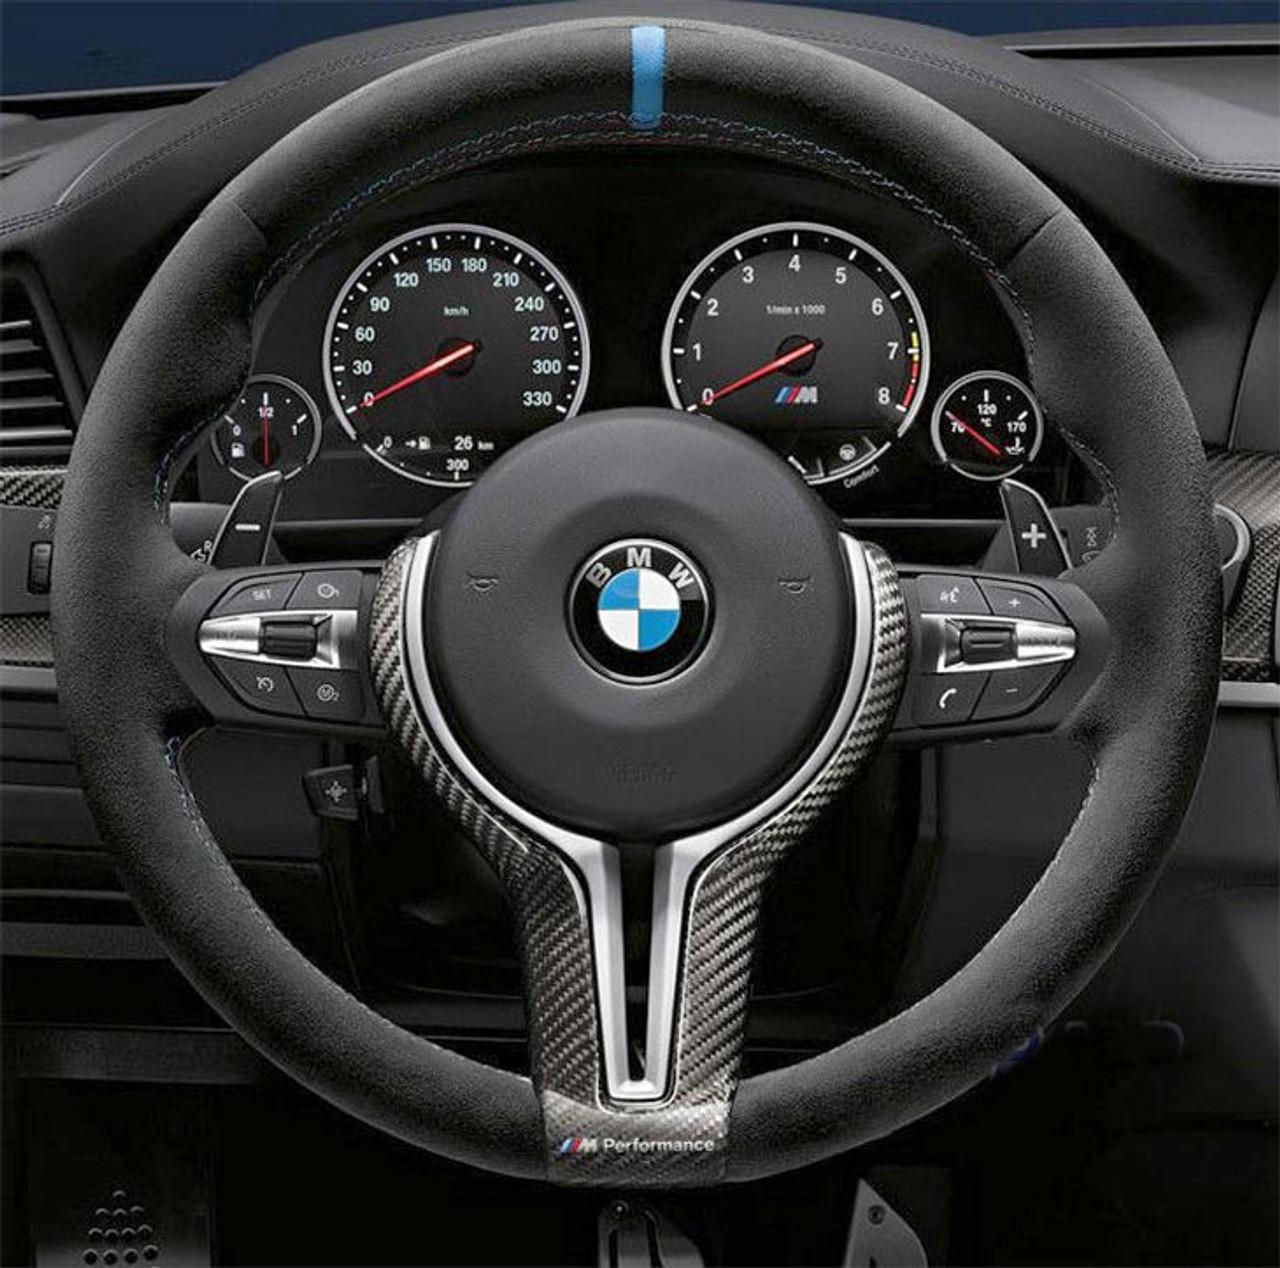 Bmw M Performance Steering Wheel Alcantara Carbon Fiber With Blue Stripe For M3 M4